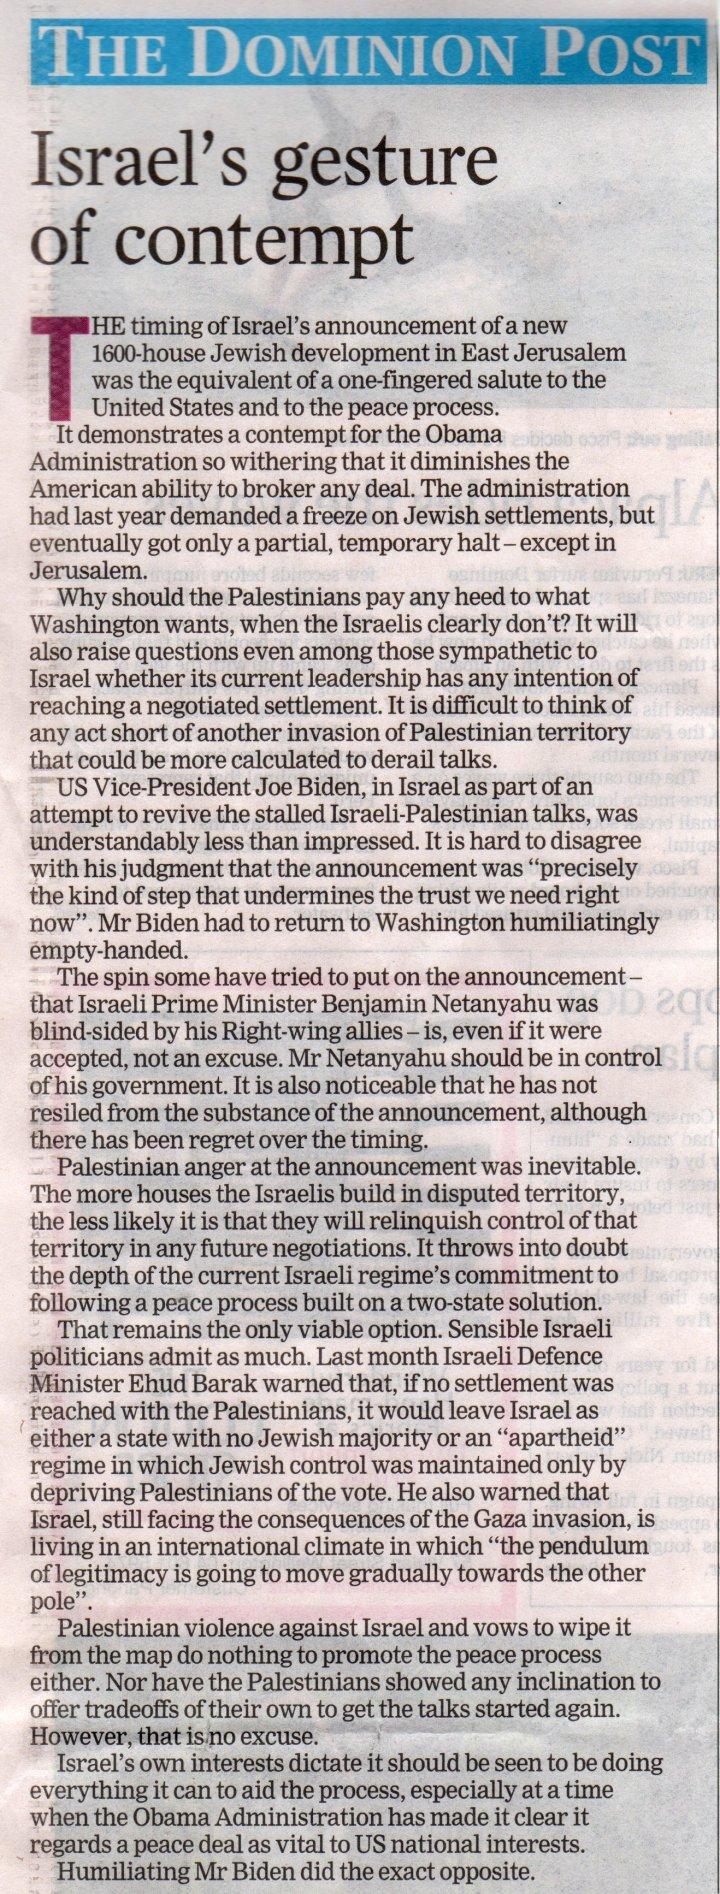 Israel's gesture of contempt